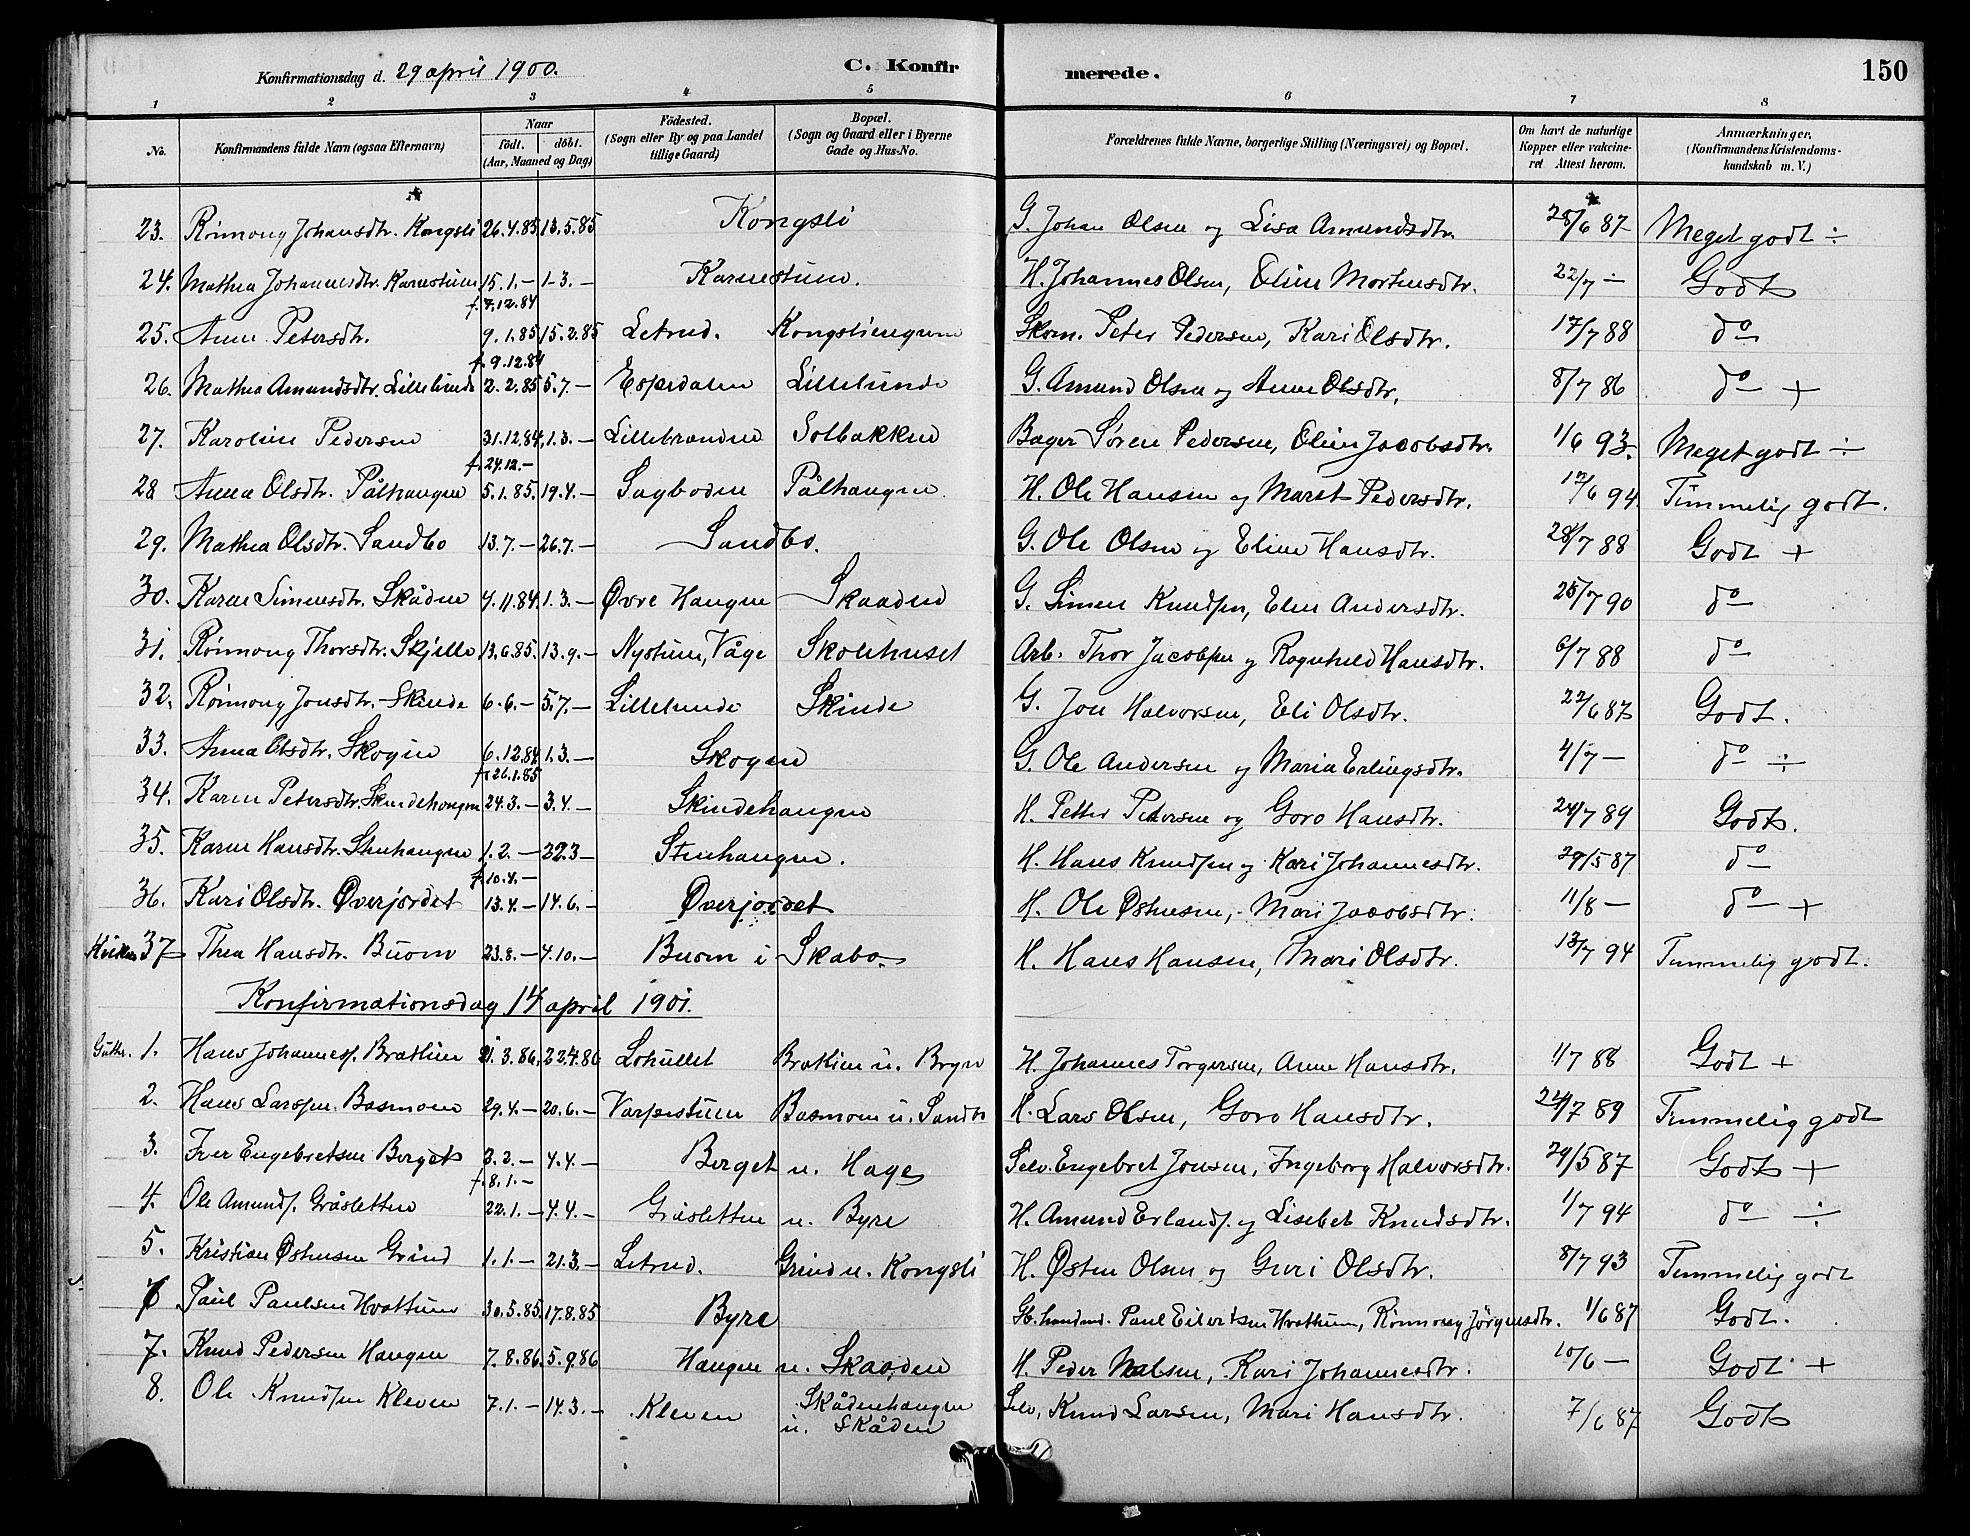 SAH, Nord-Fron prestekontor, Klokkerbok nr. 4, 1884-1914, s. 150